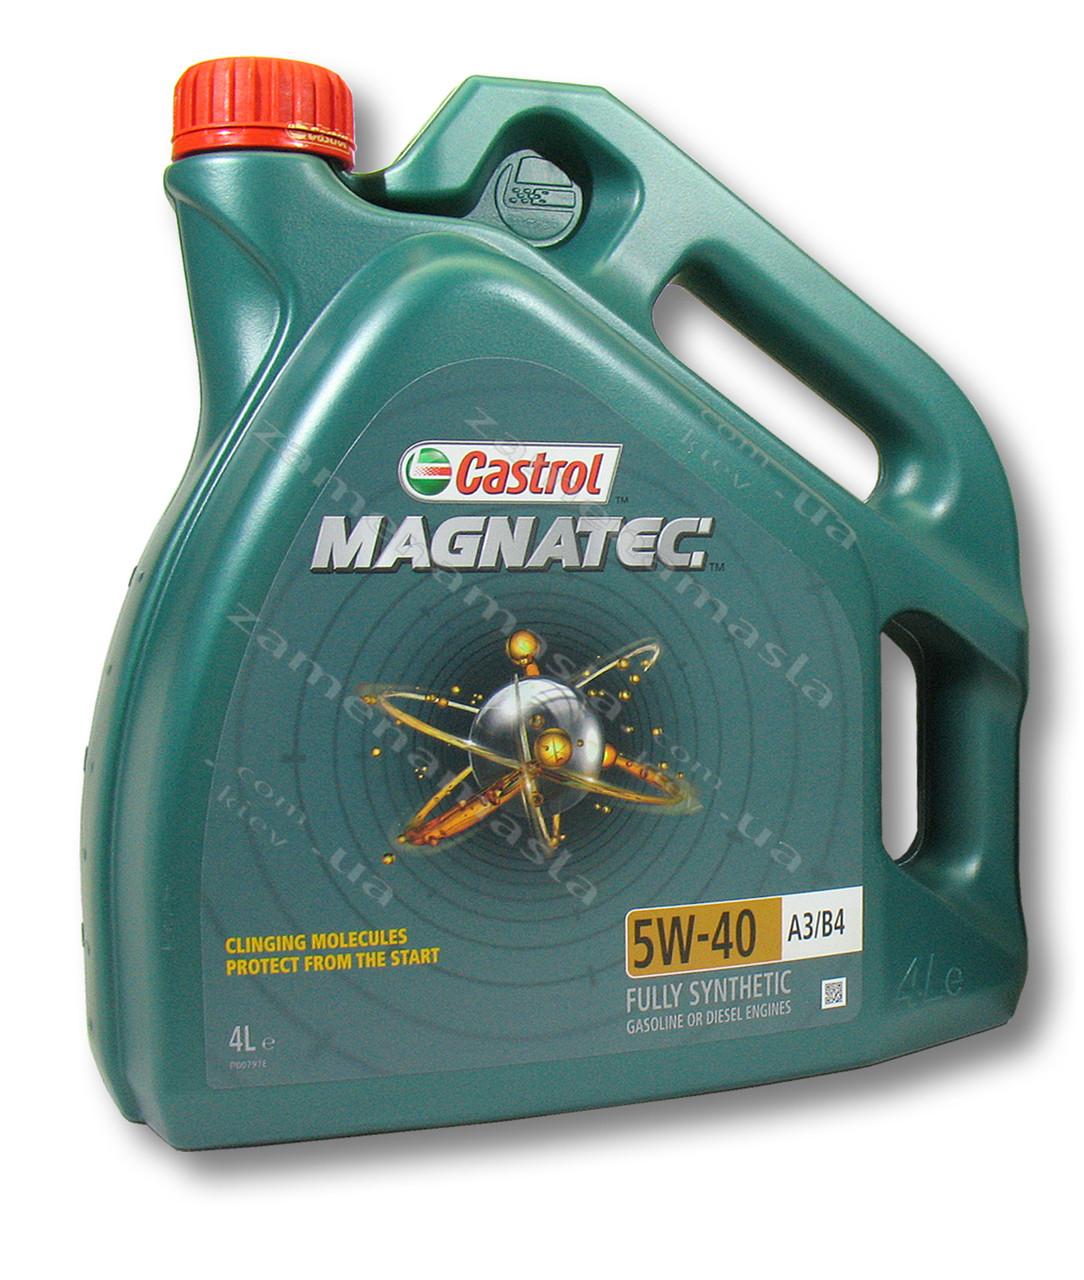 Castrol Magnatec 5W-40 A3/B4 4л - моторное масло